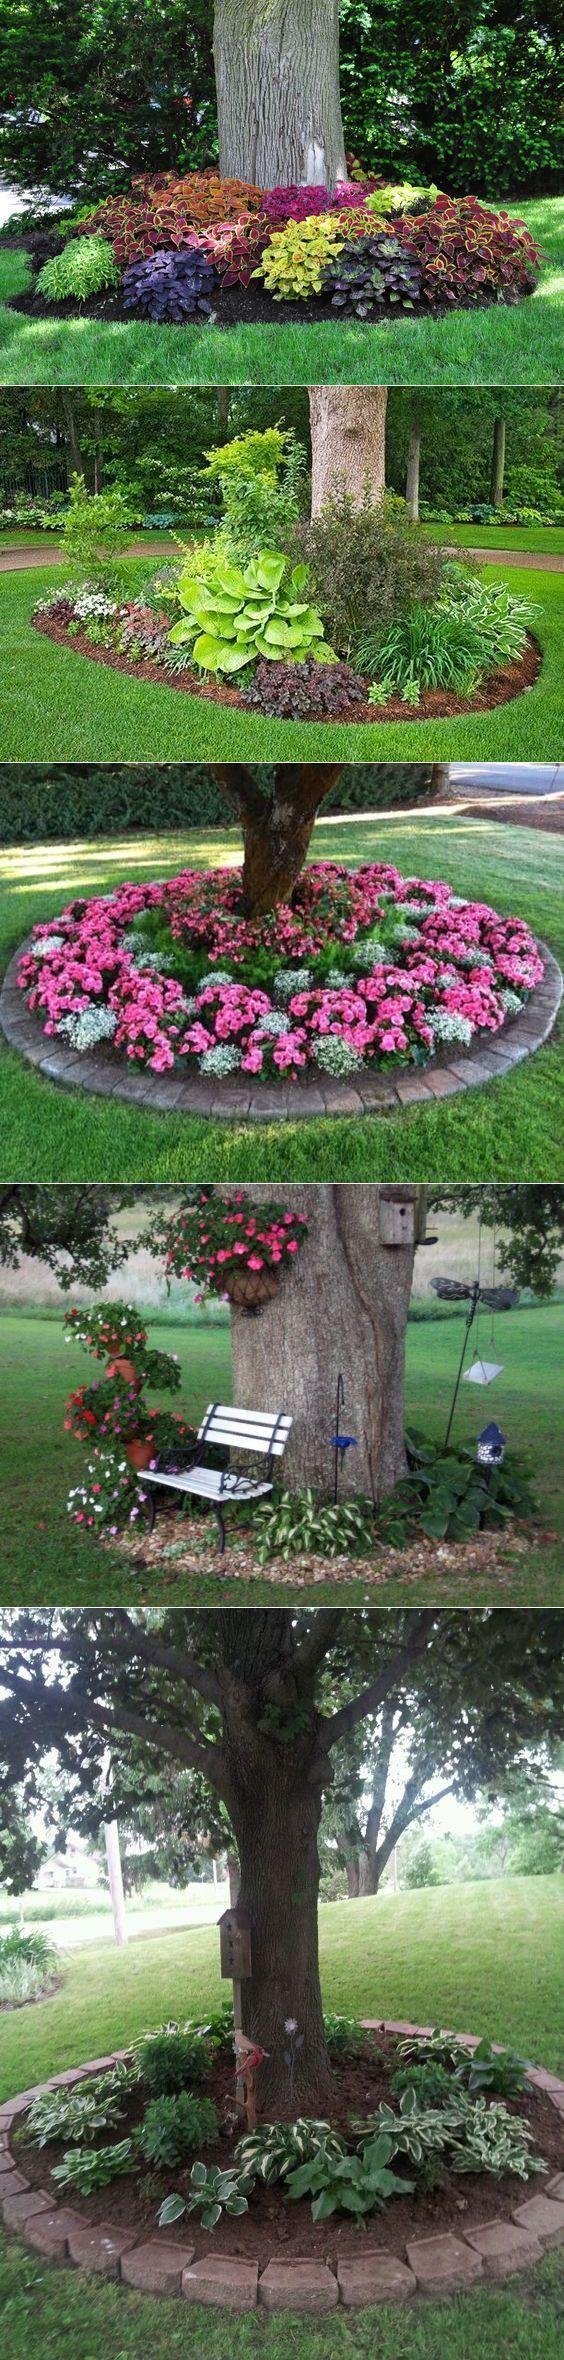 34 Simple But Effective Front Yard Landscaping Ideas On A Budget Garden Yard Ideas Backyard Landscaping Yard Landscaping